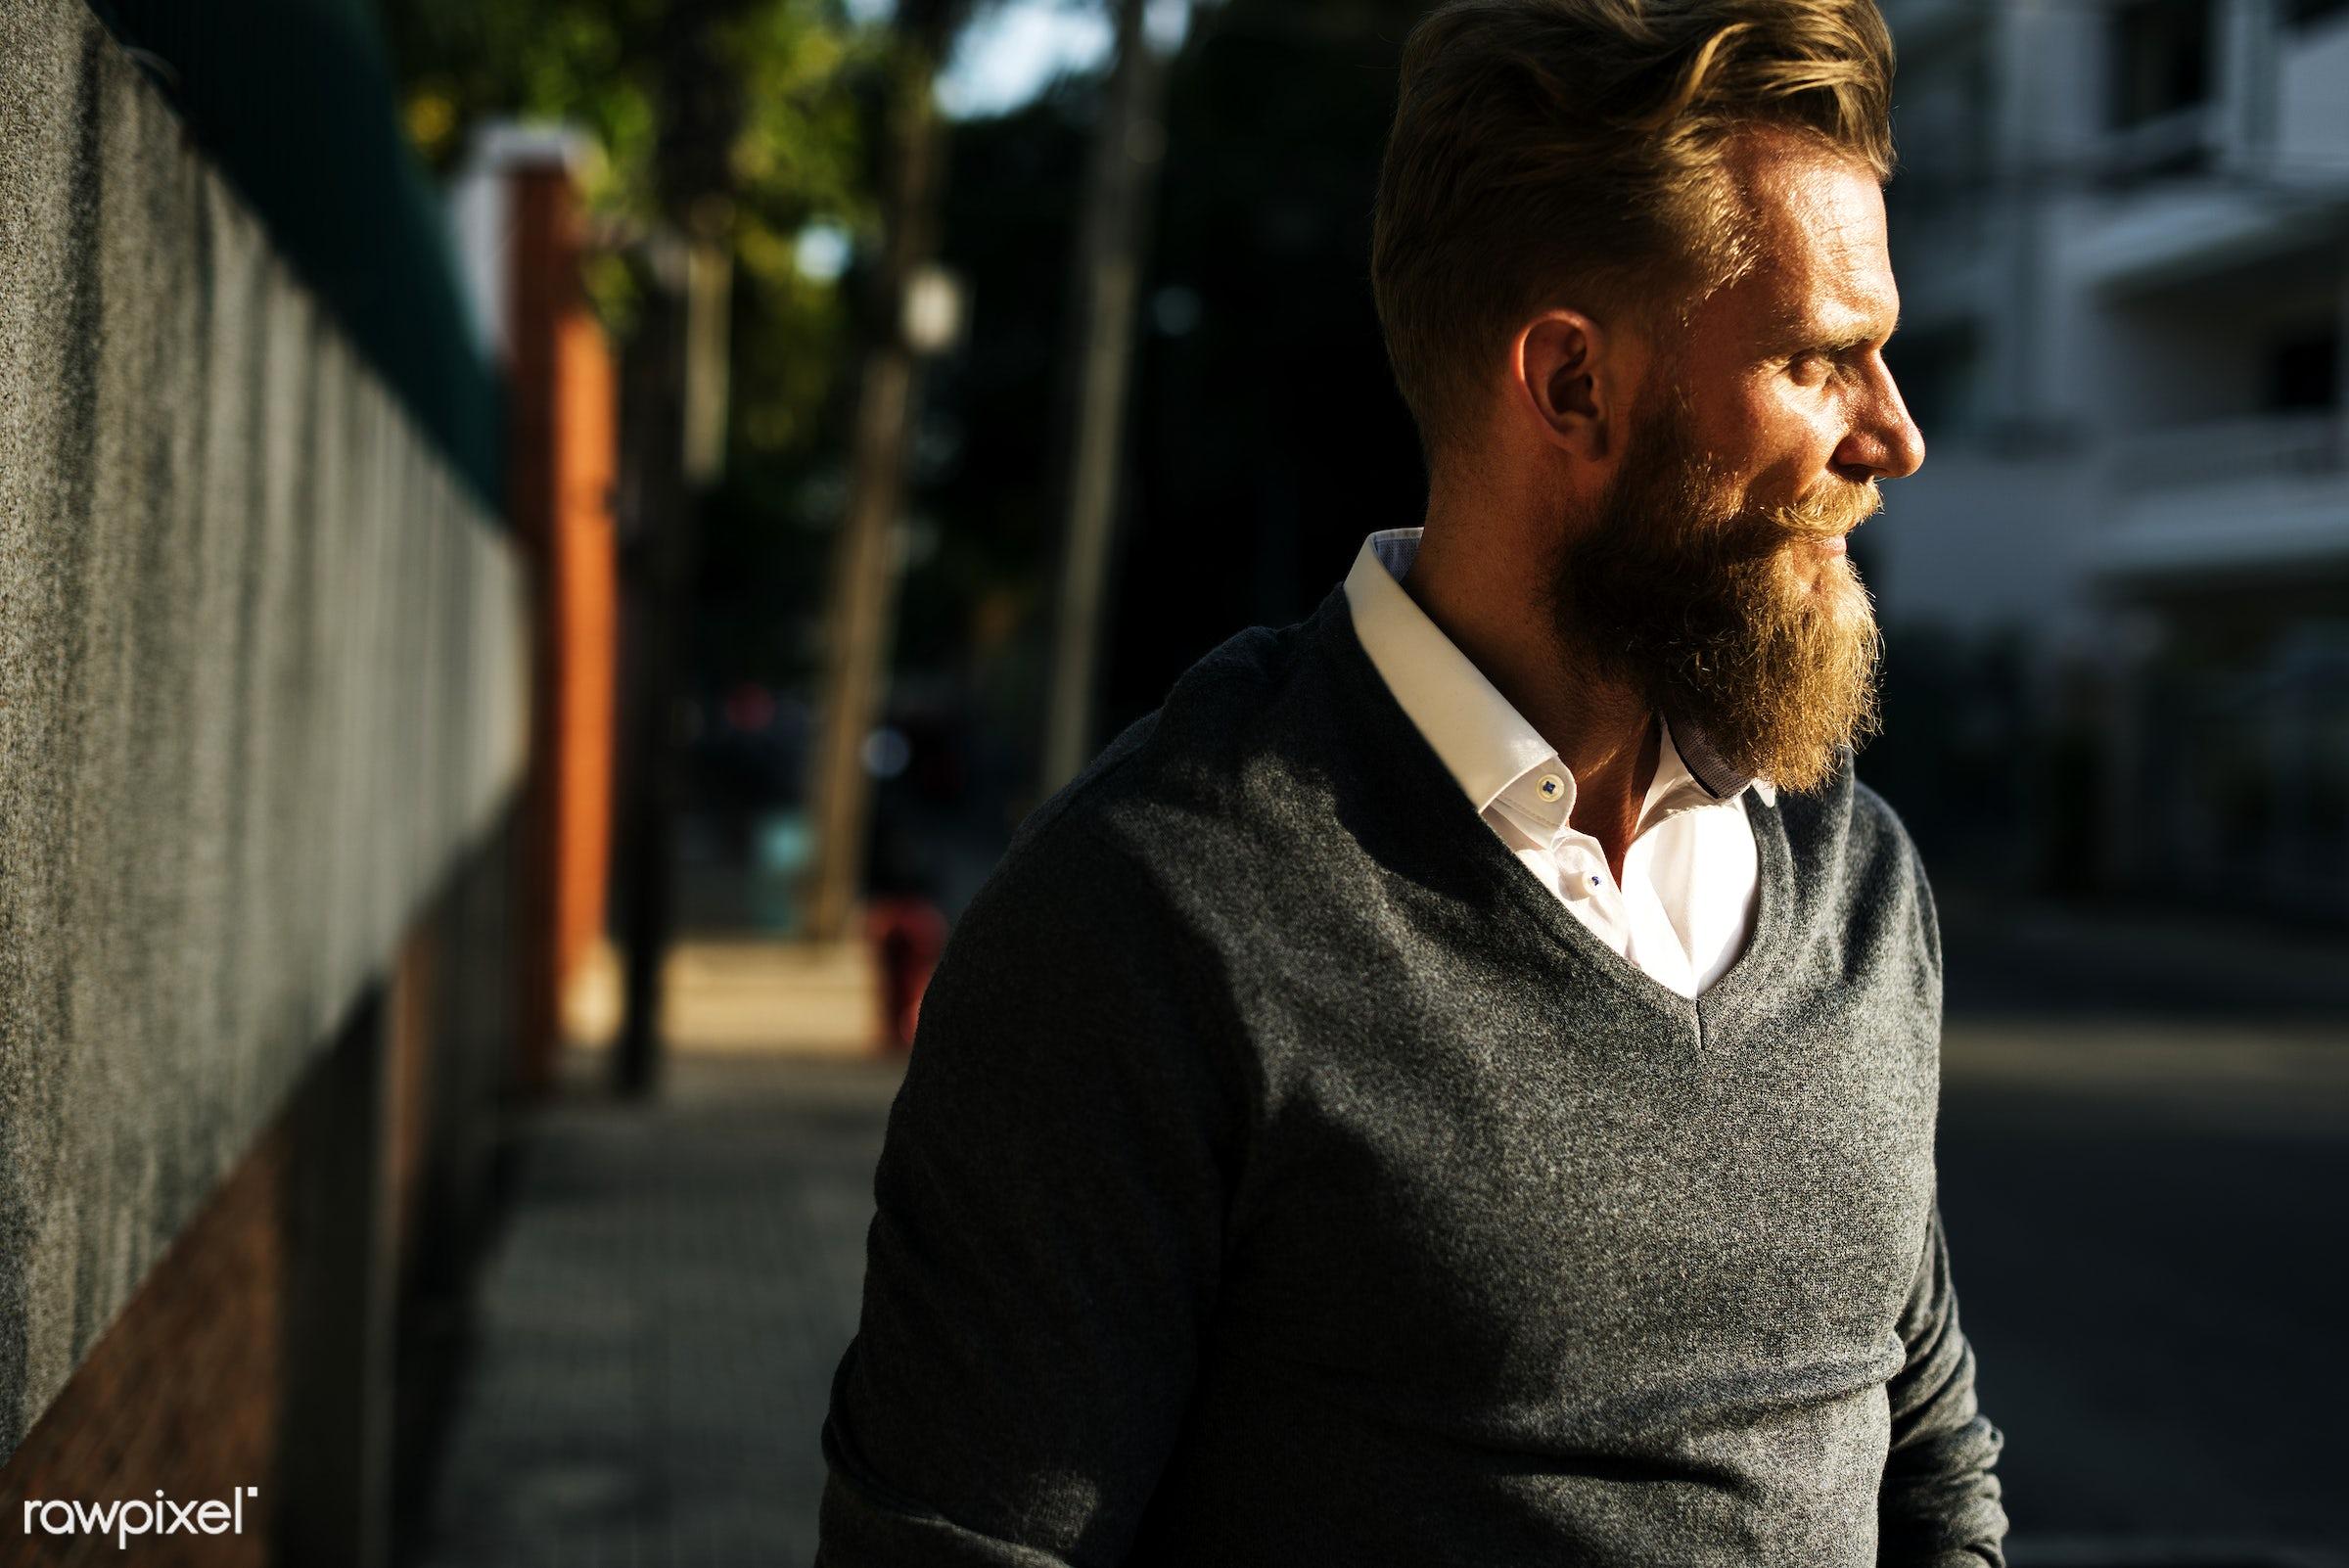 cc0, alone, beard, city, commuter, creative common 0, creative commons 0, footpath, man, pedestrian, person, sidewalk,...